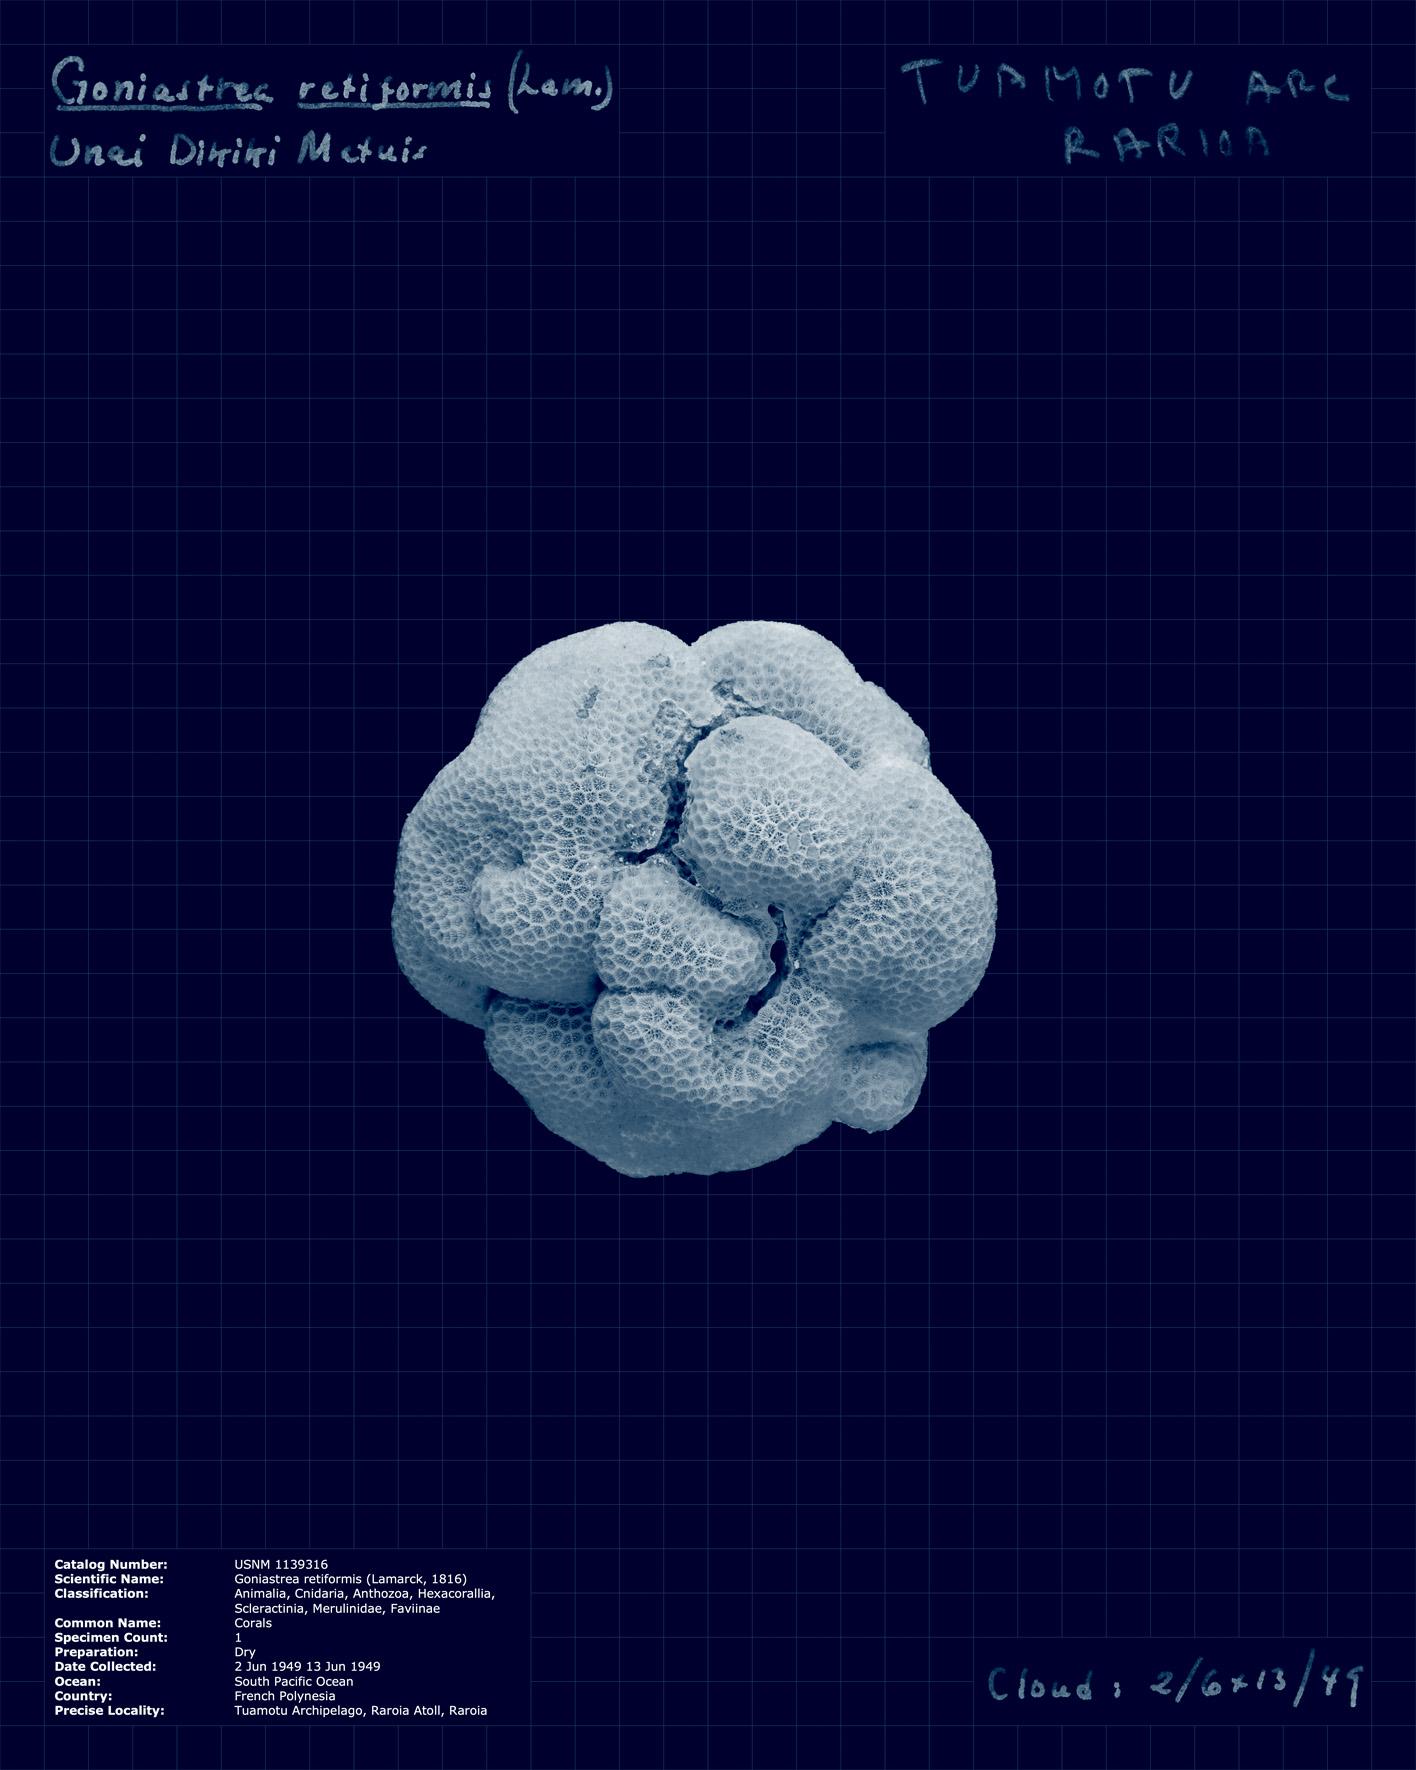 Goniastrea retiformis.jpg